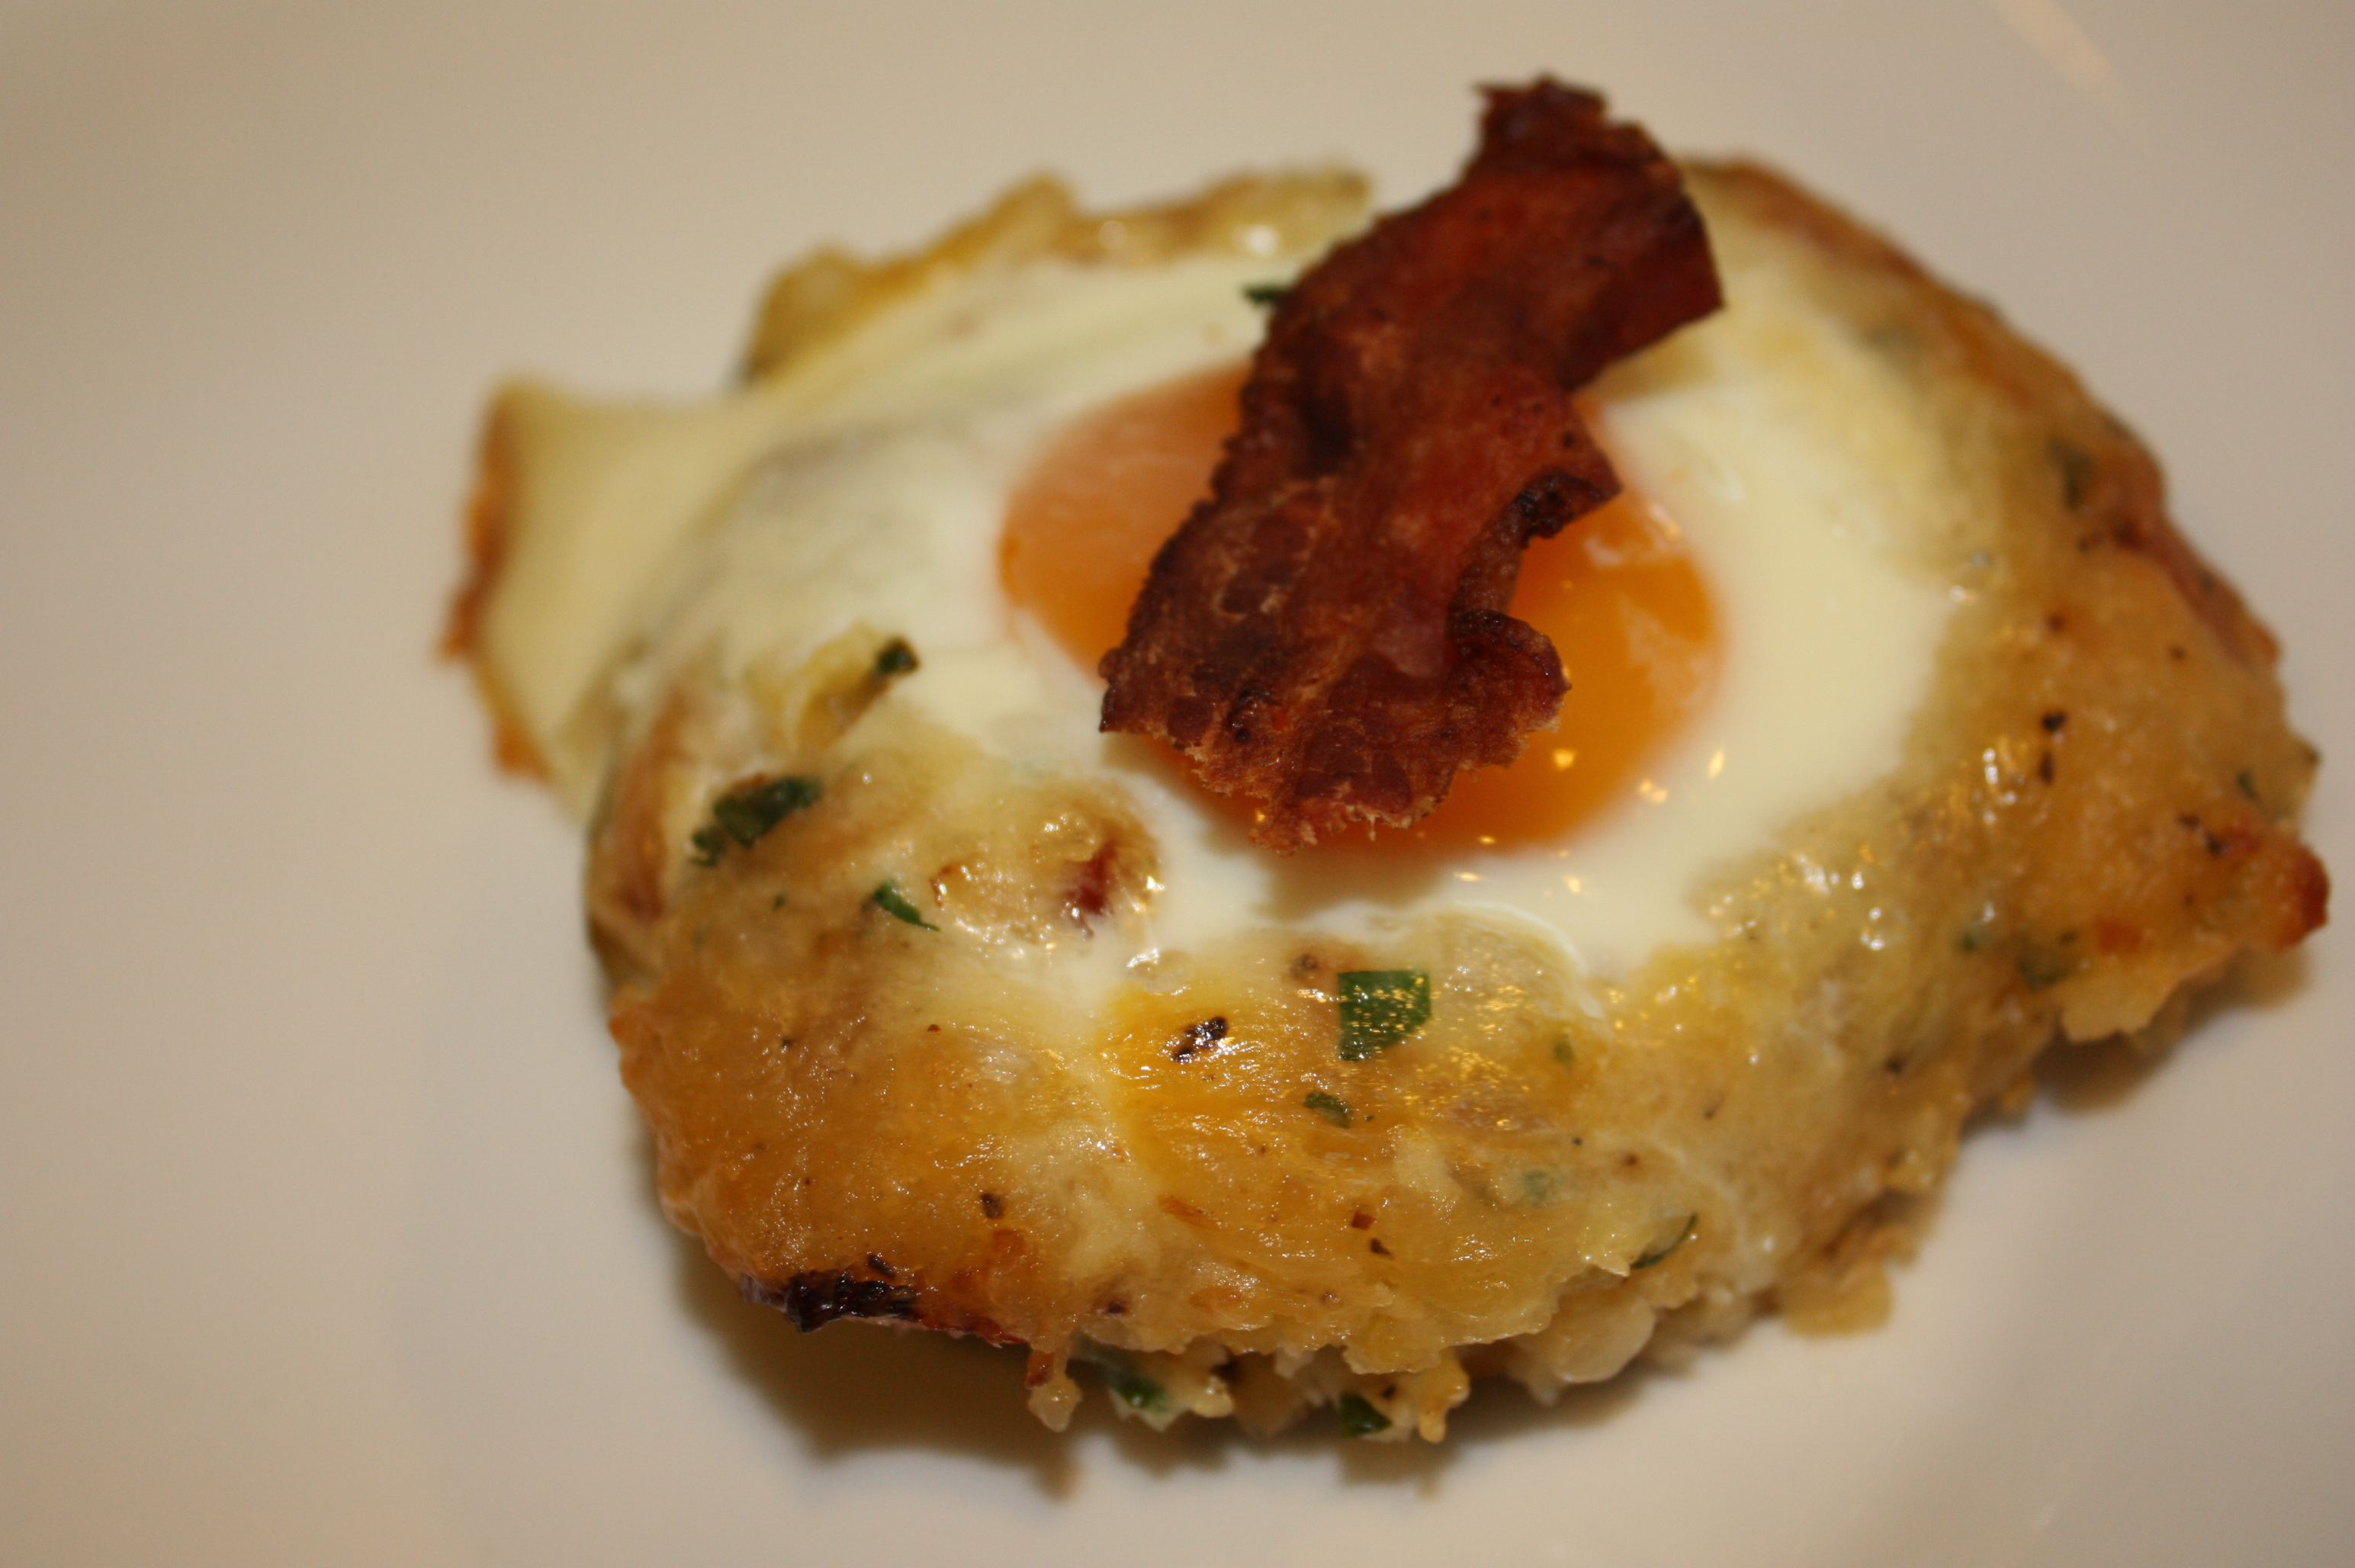 Stuffed Potato with Egg and Bacon